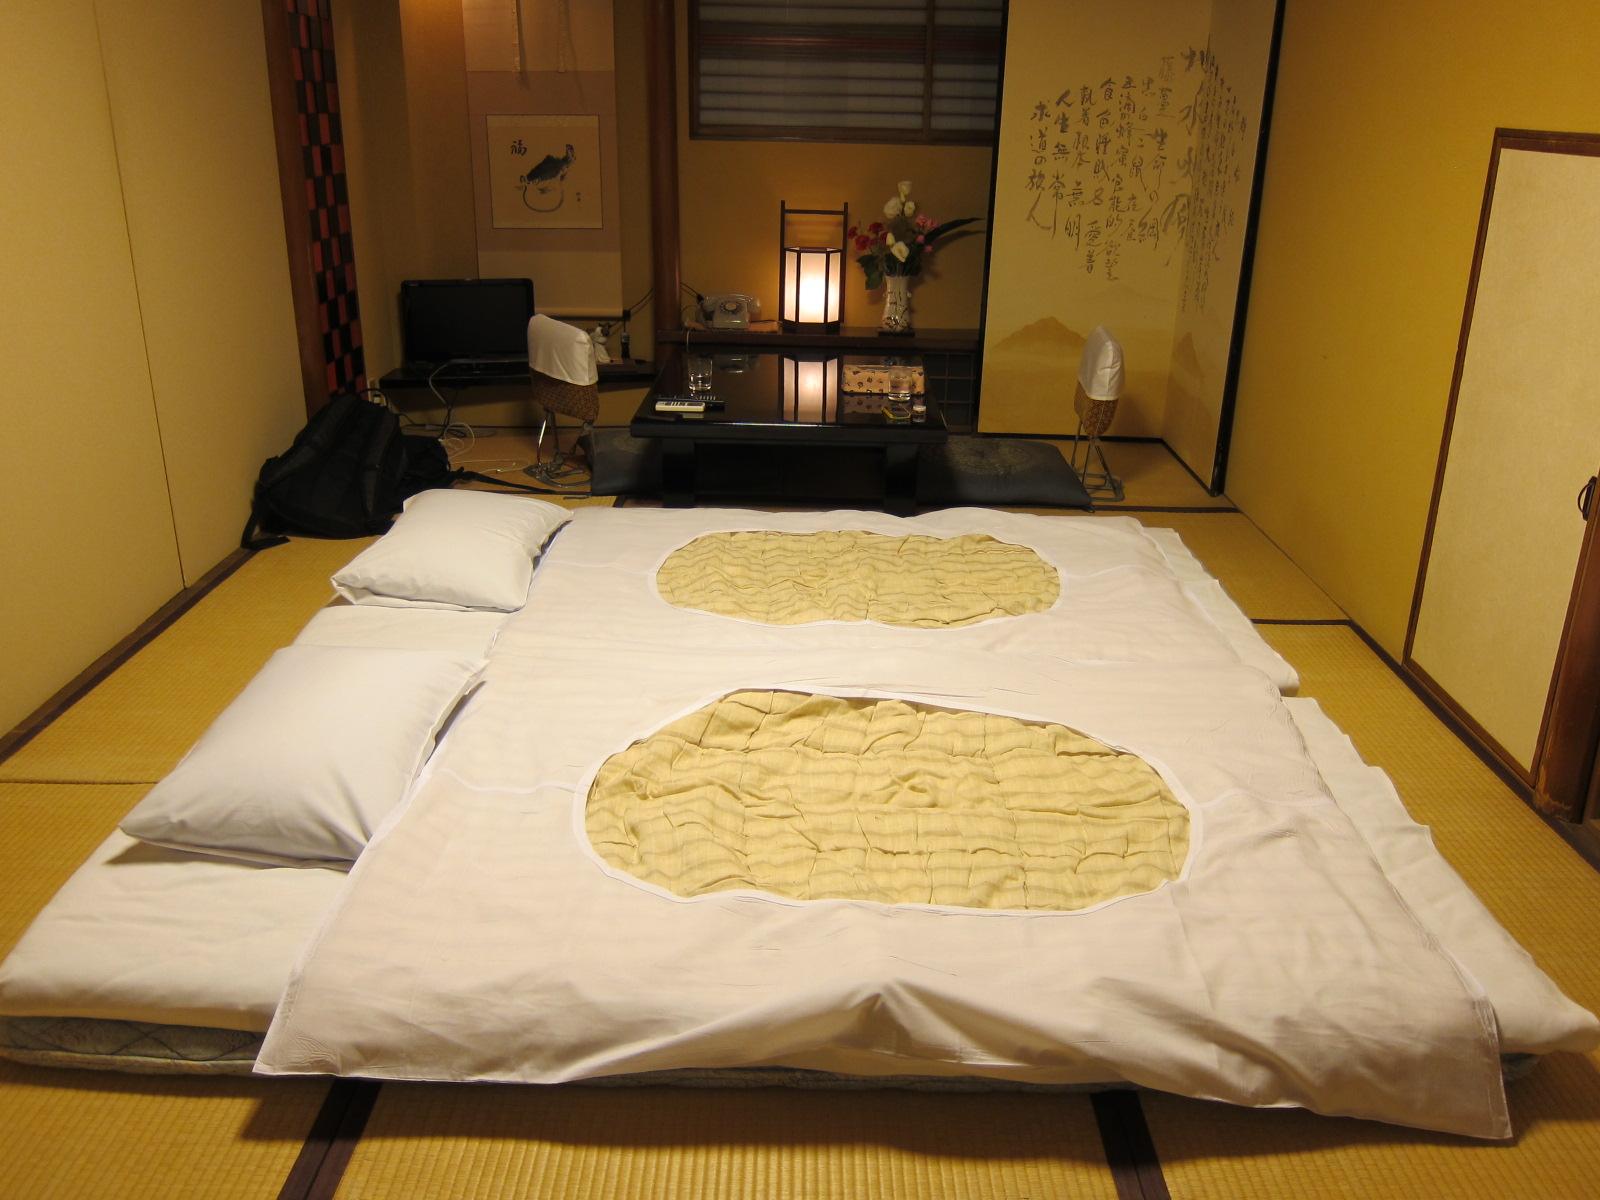 kyoto day 1 kikokuso ryokan and a kaiseki dinner lucy. Black Bedroom Furniture Sets. Home Design Ideas